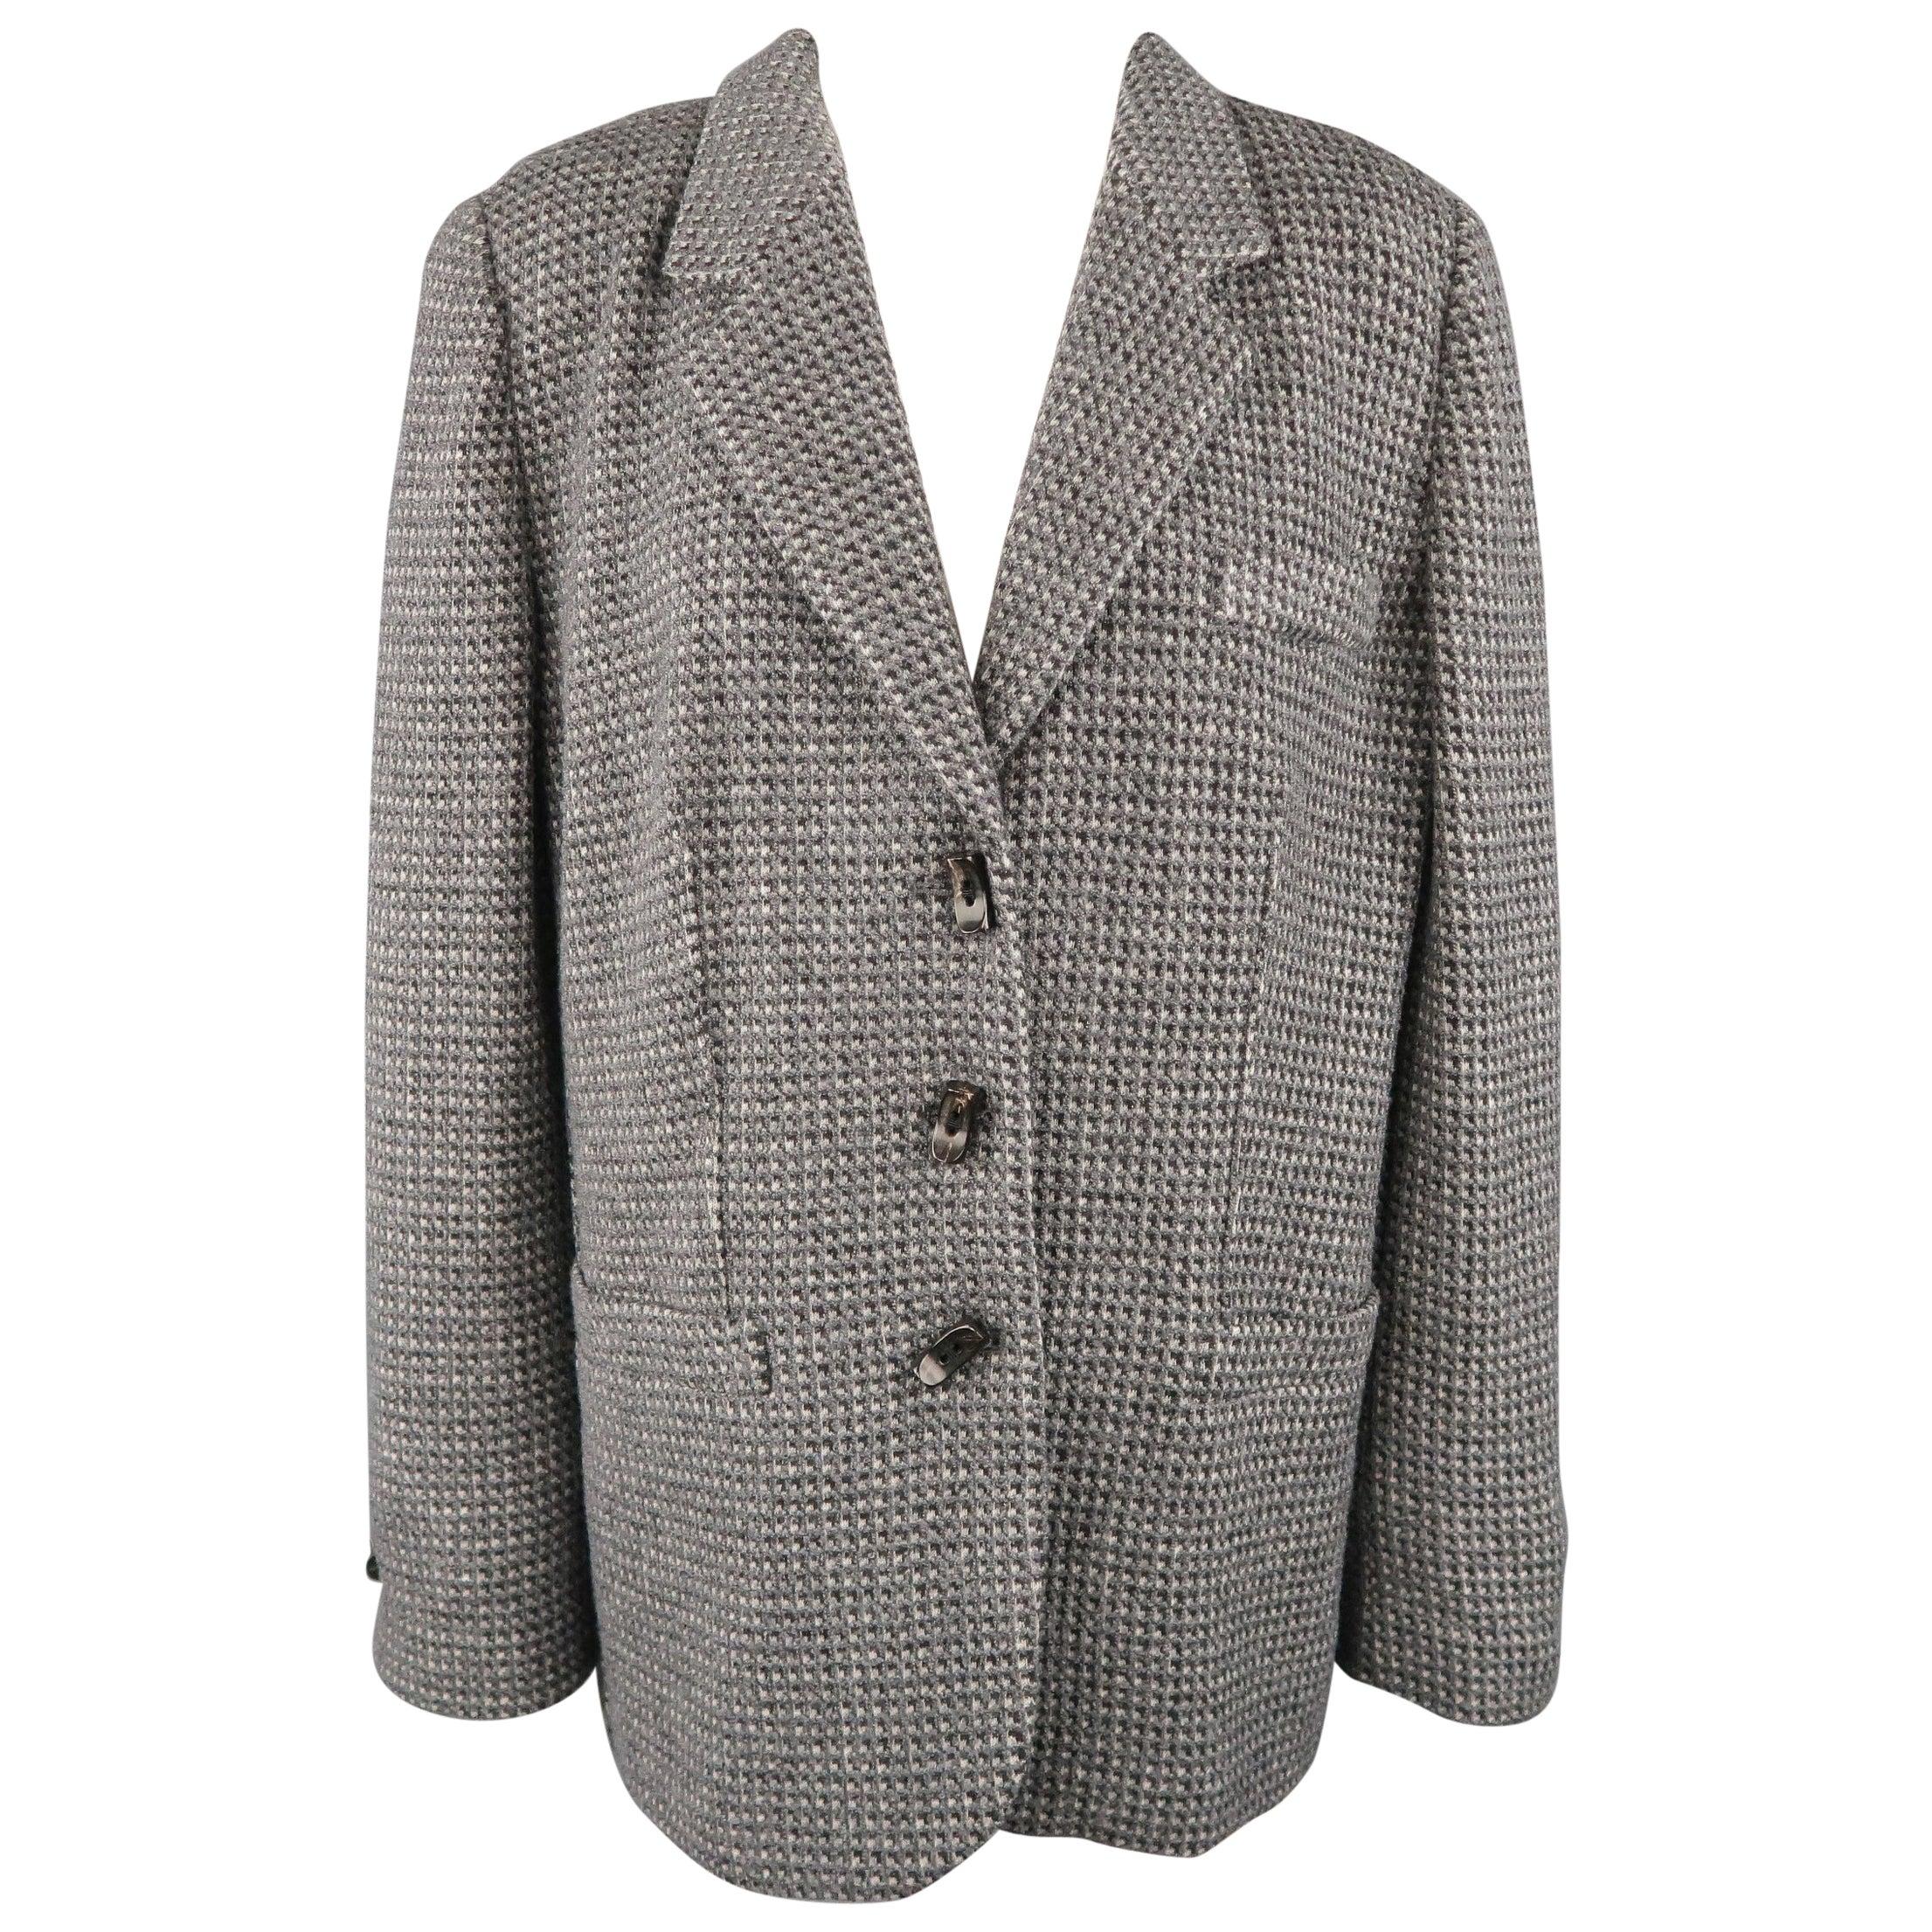 GIORGIO ARMANI Size 16 Grey Textured Wool Blend Notch Lapel Jacket